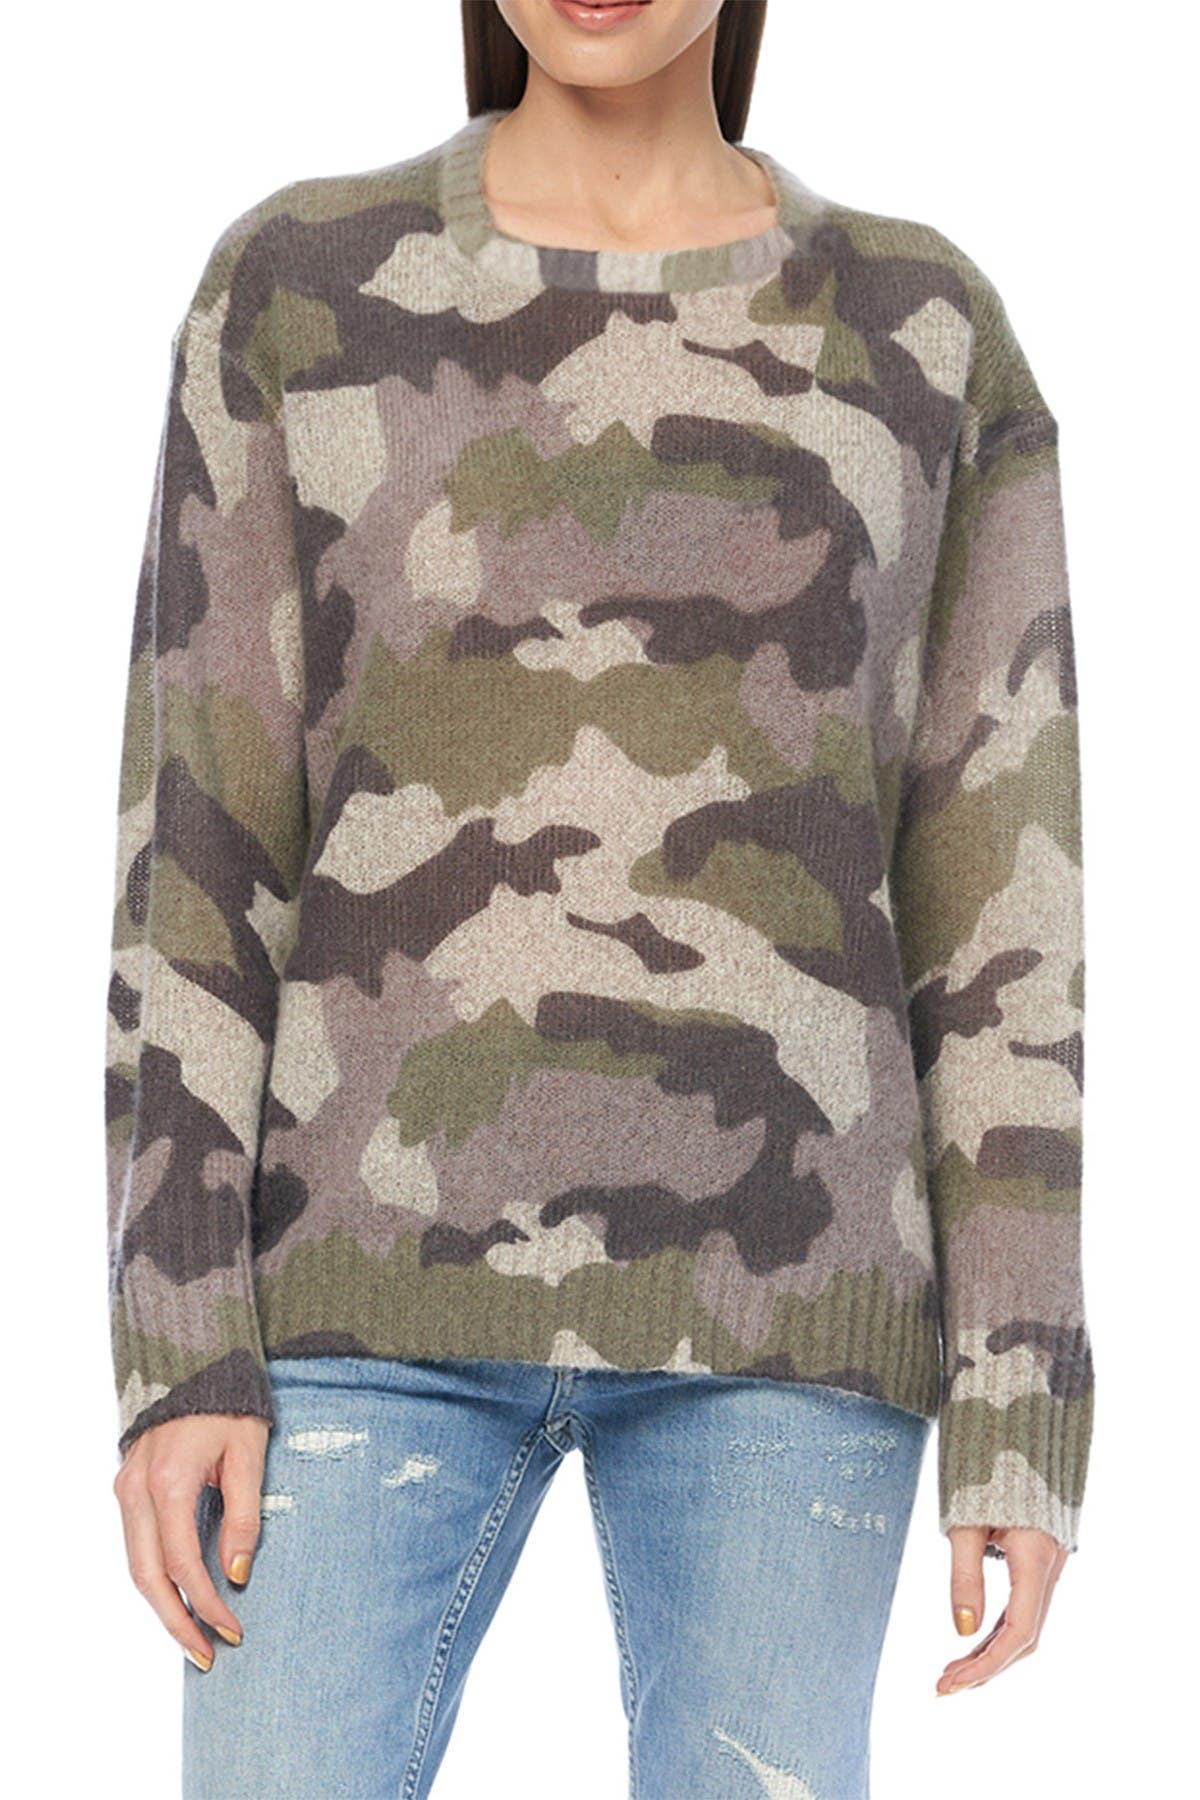 Image of 360 Cashmere Dahlia Camo Knit Sweater